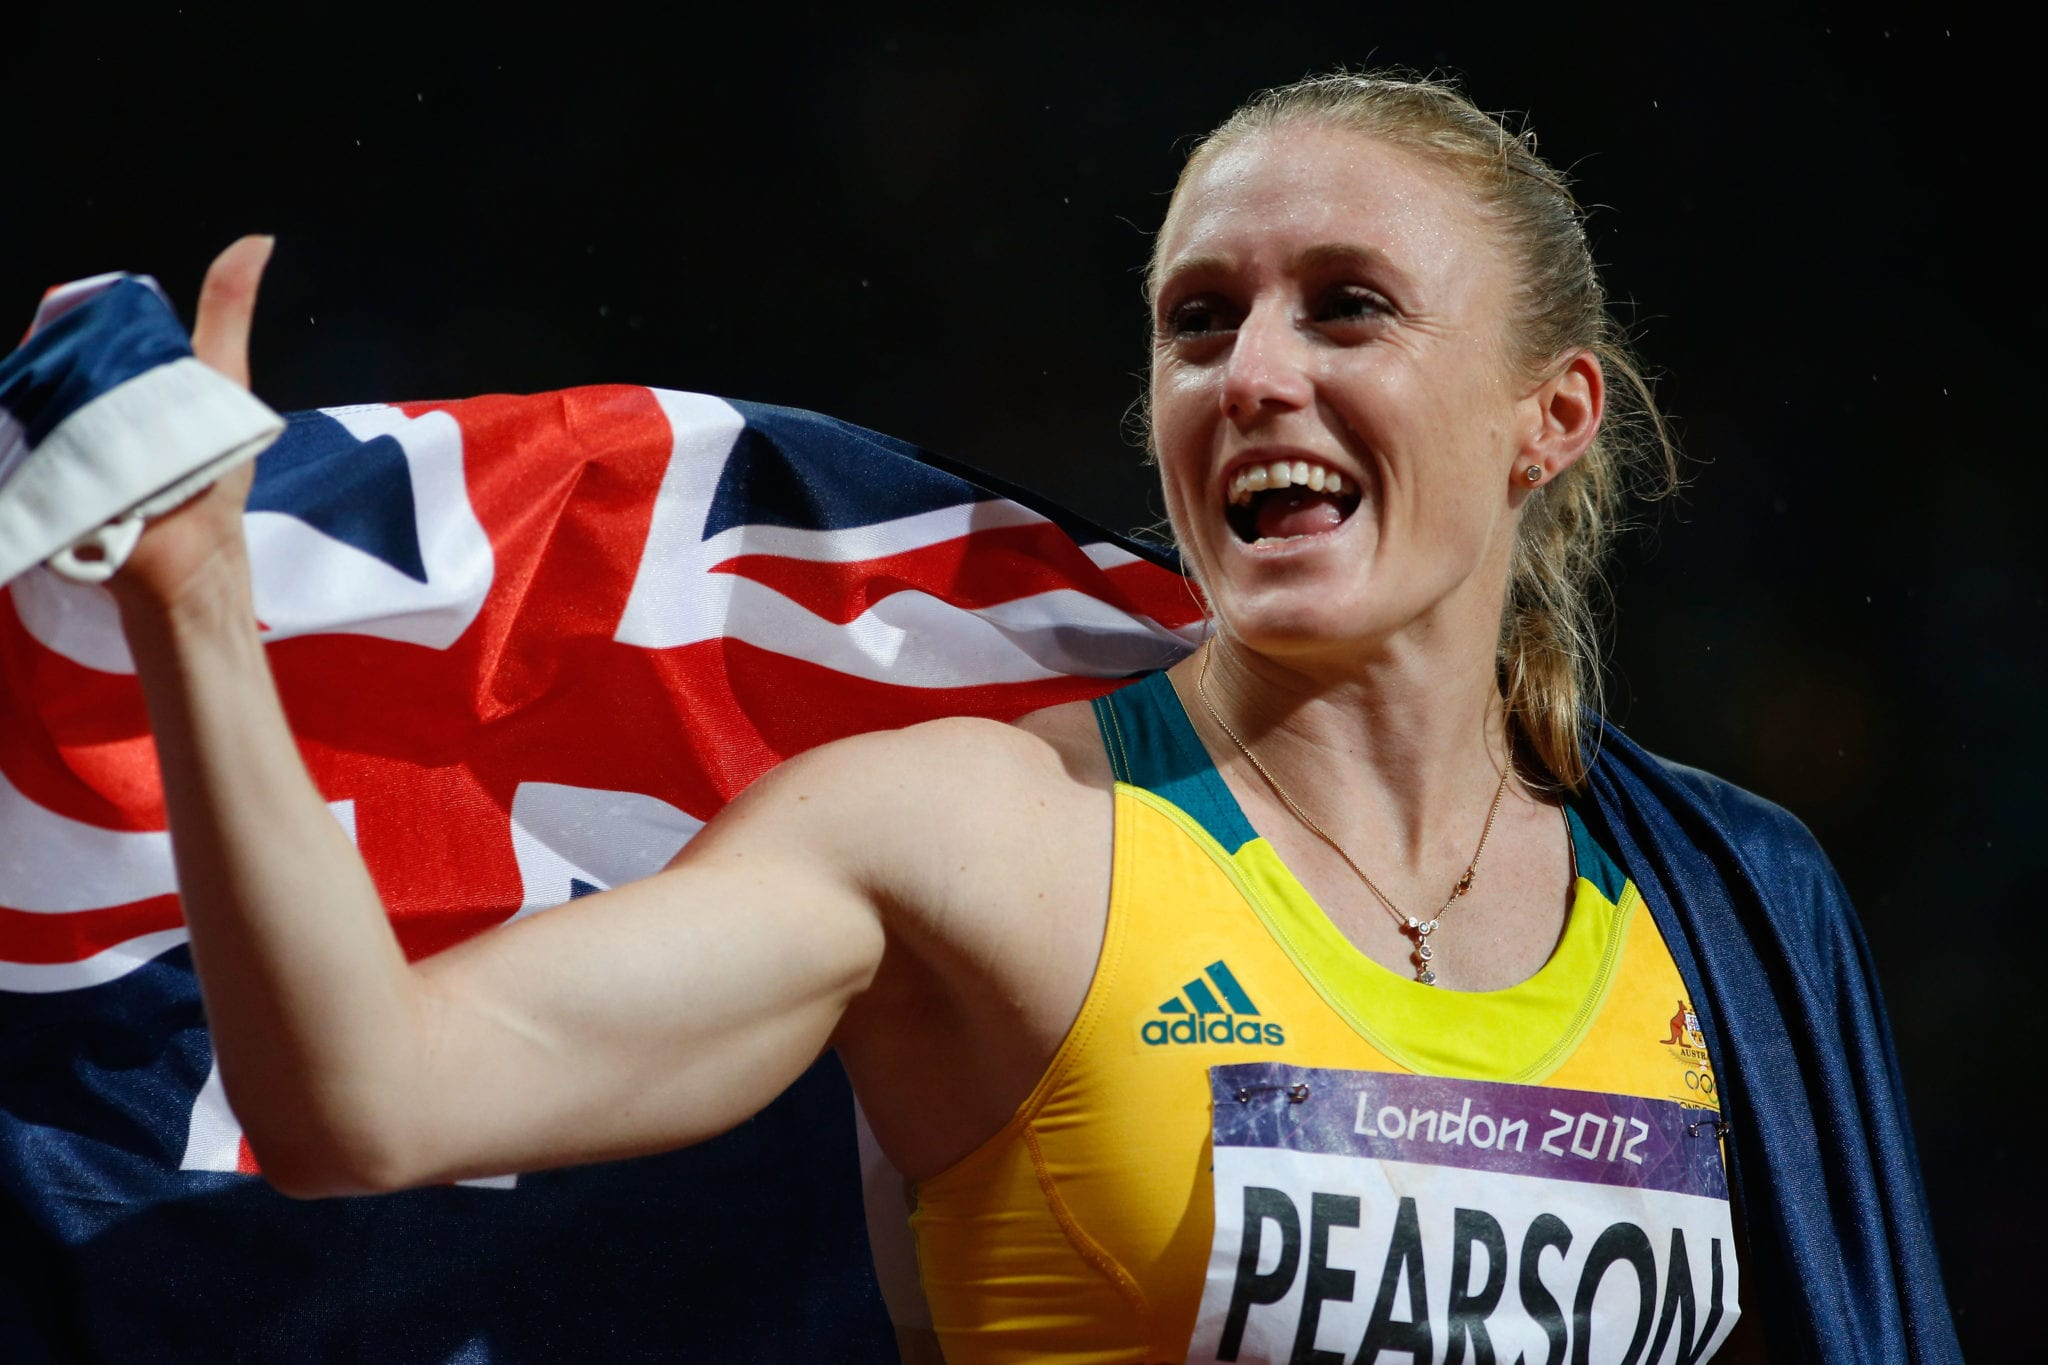 olympic hurdler pearson - HD2048×1365